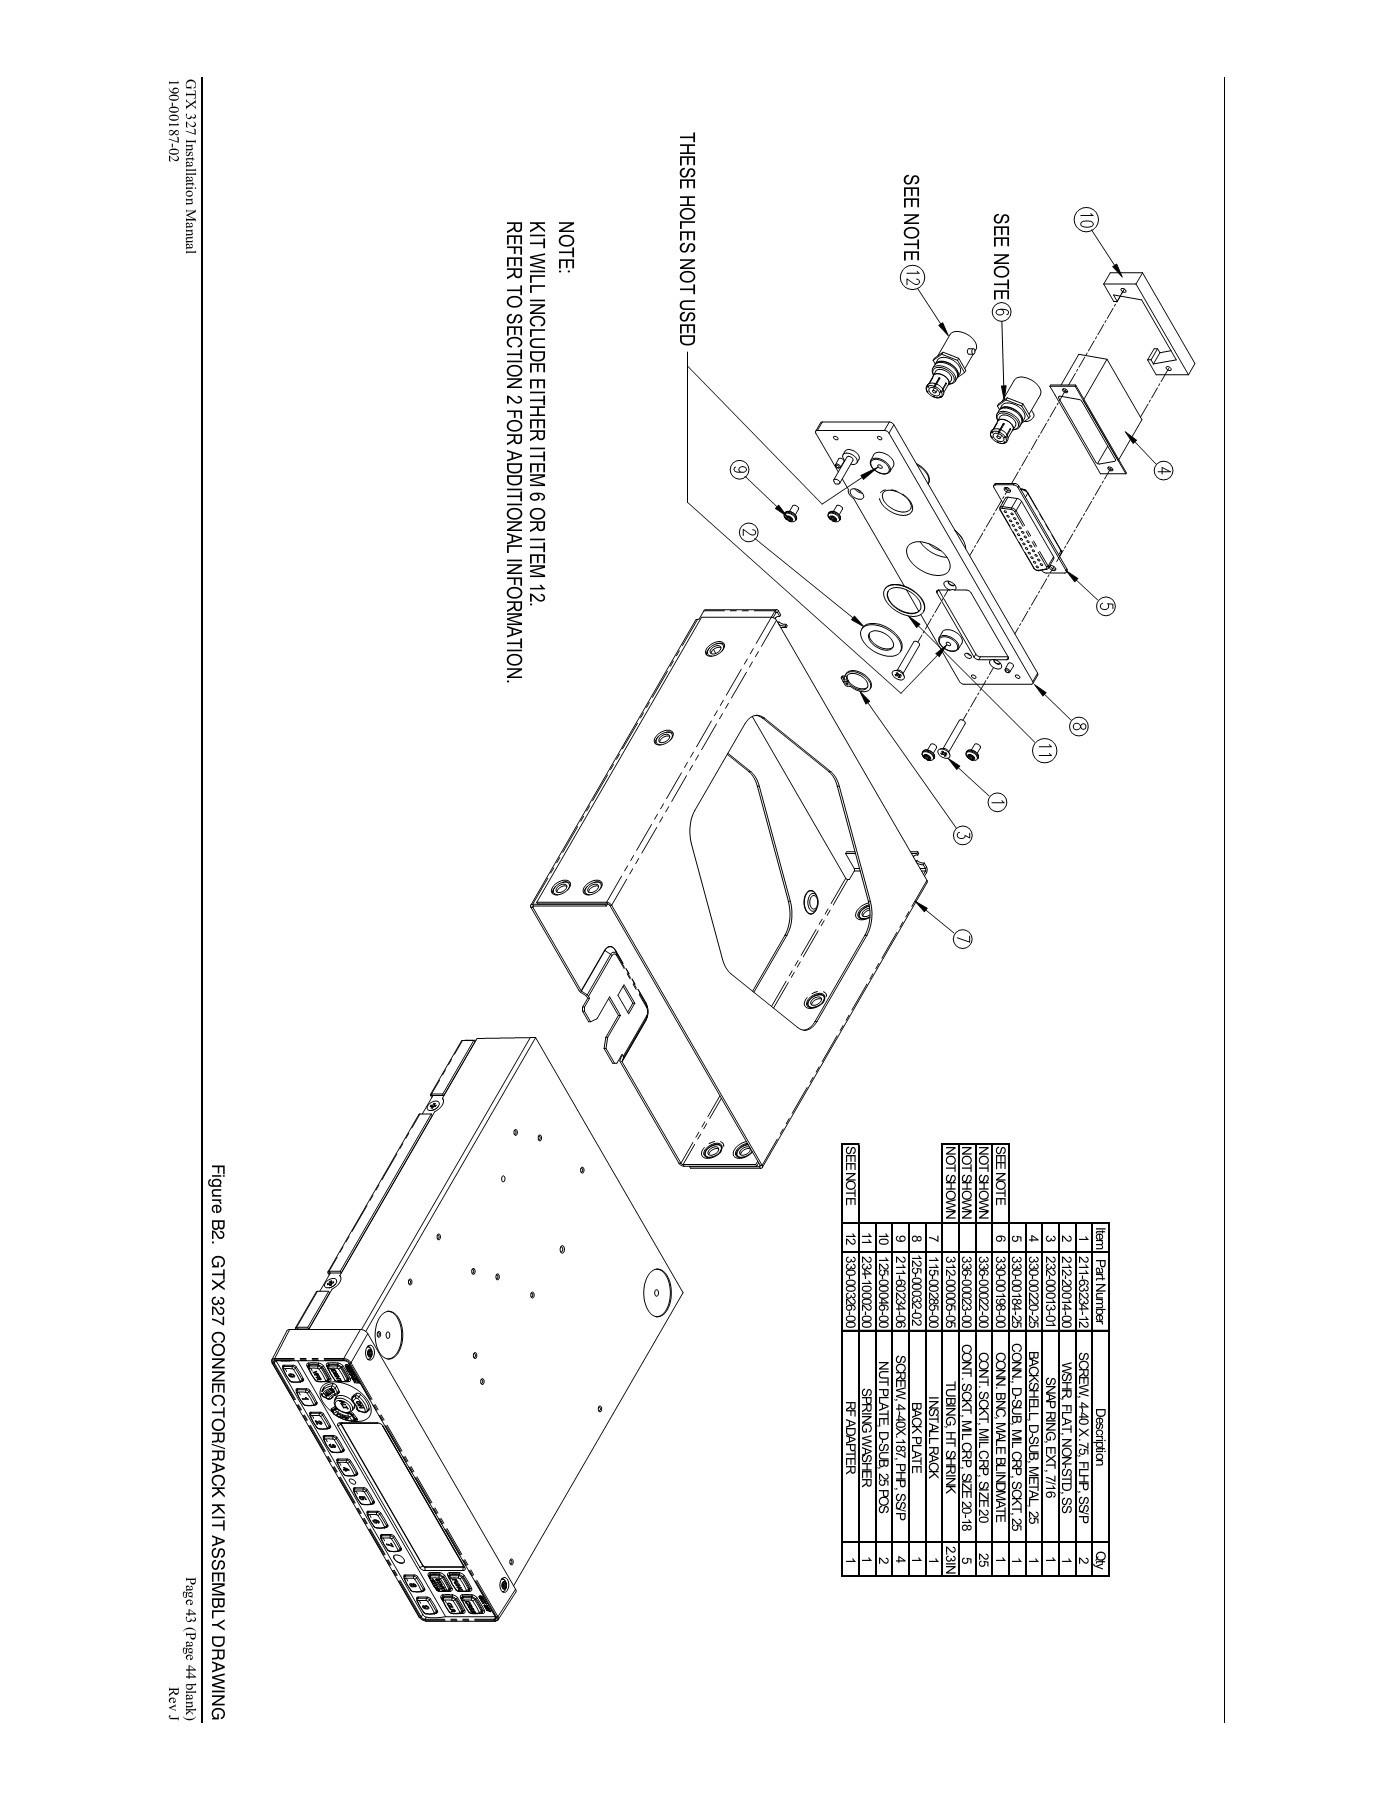 Garmin Gtx 327 Wiring Diagram